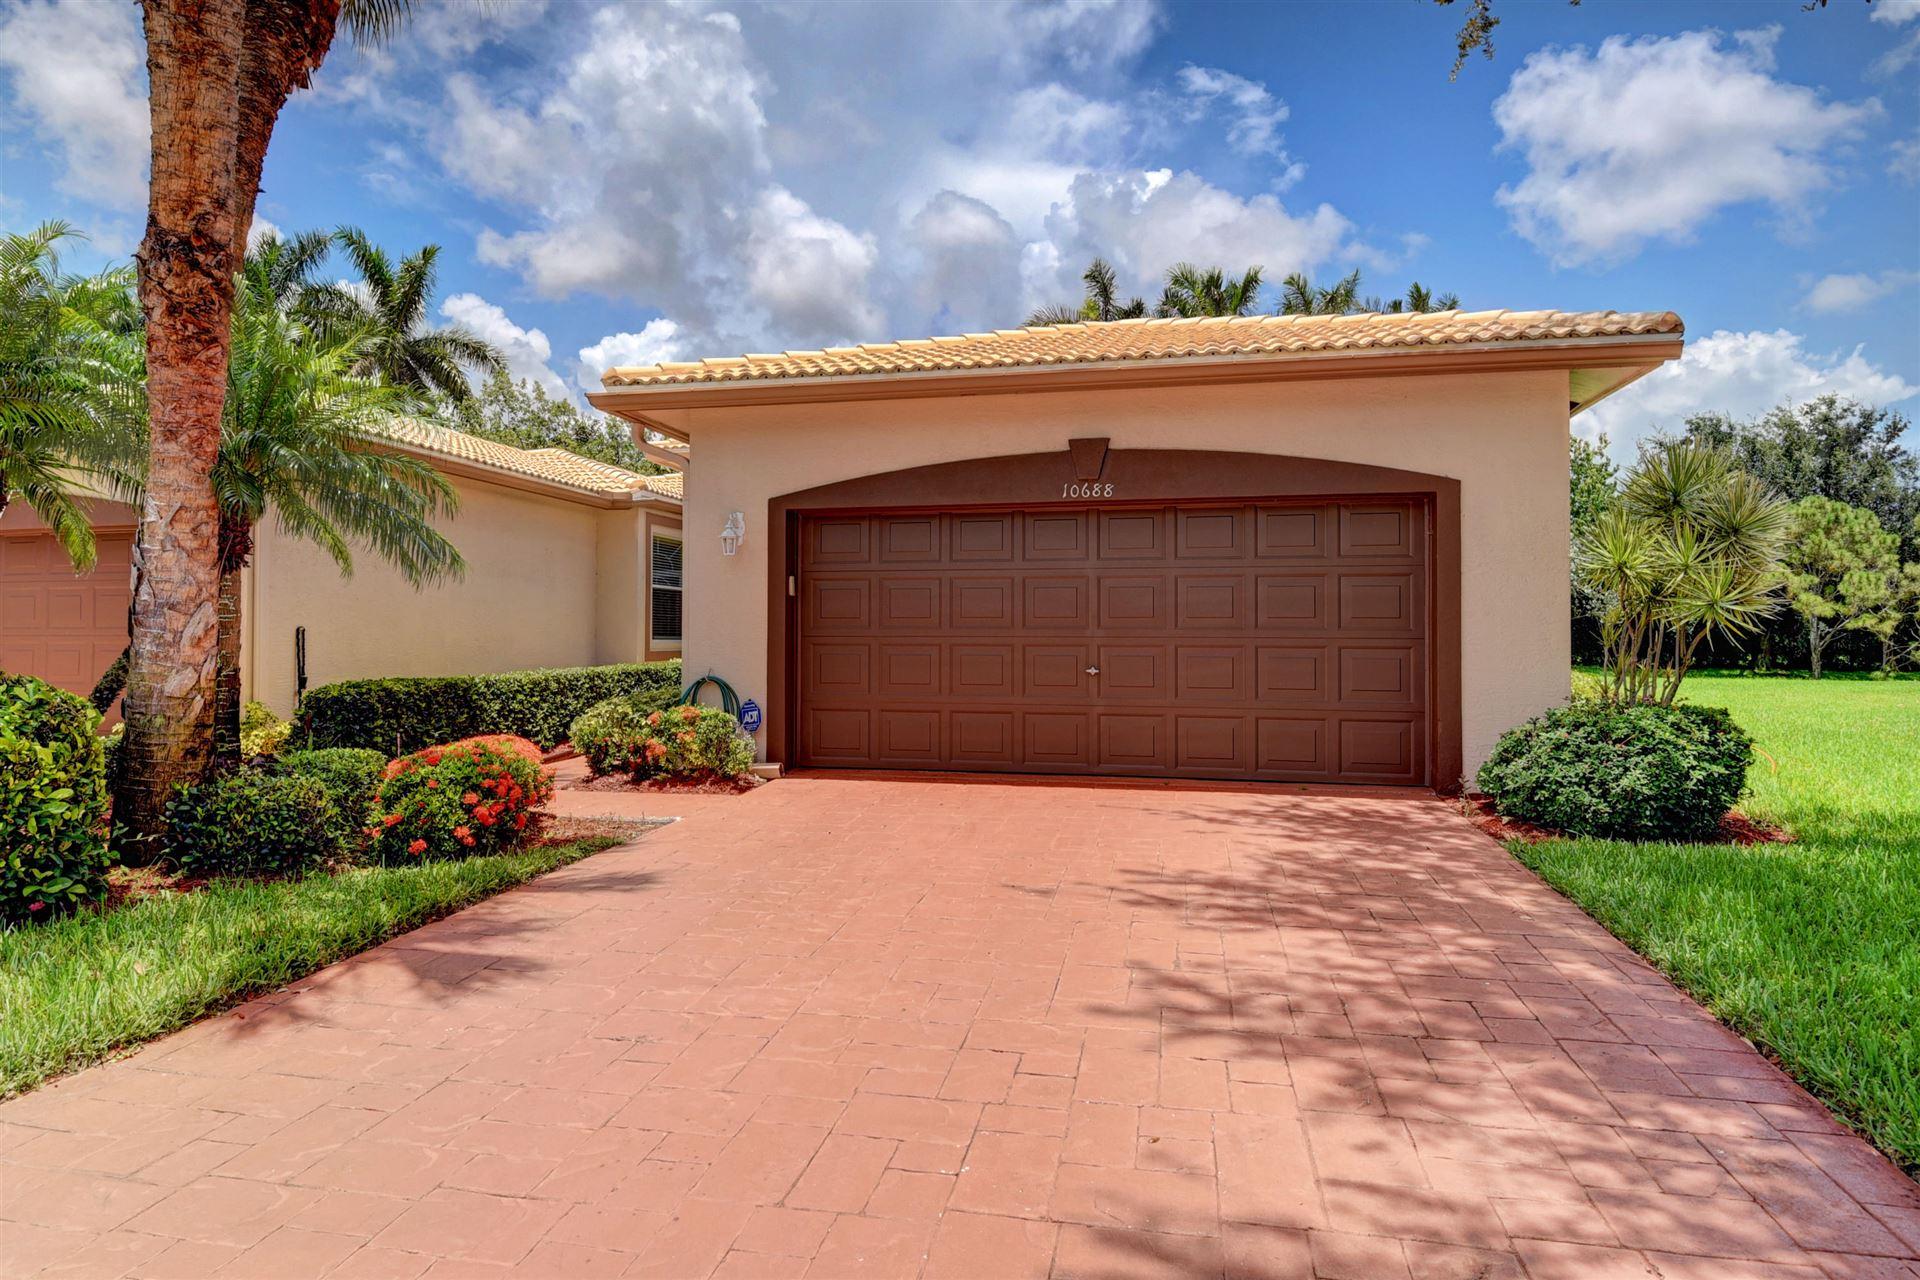 10688 Royal Caribbean Circle, Boynton Beach, FL 33437 - #: RX-10640273